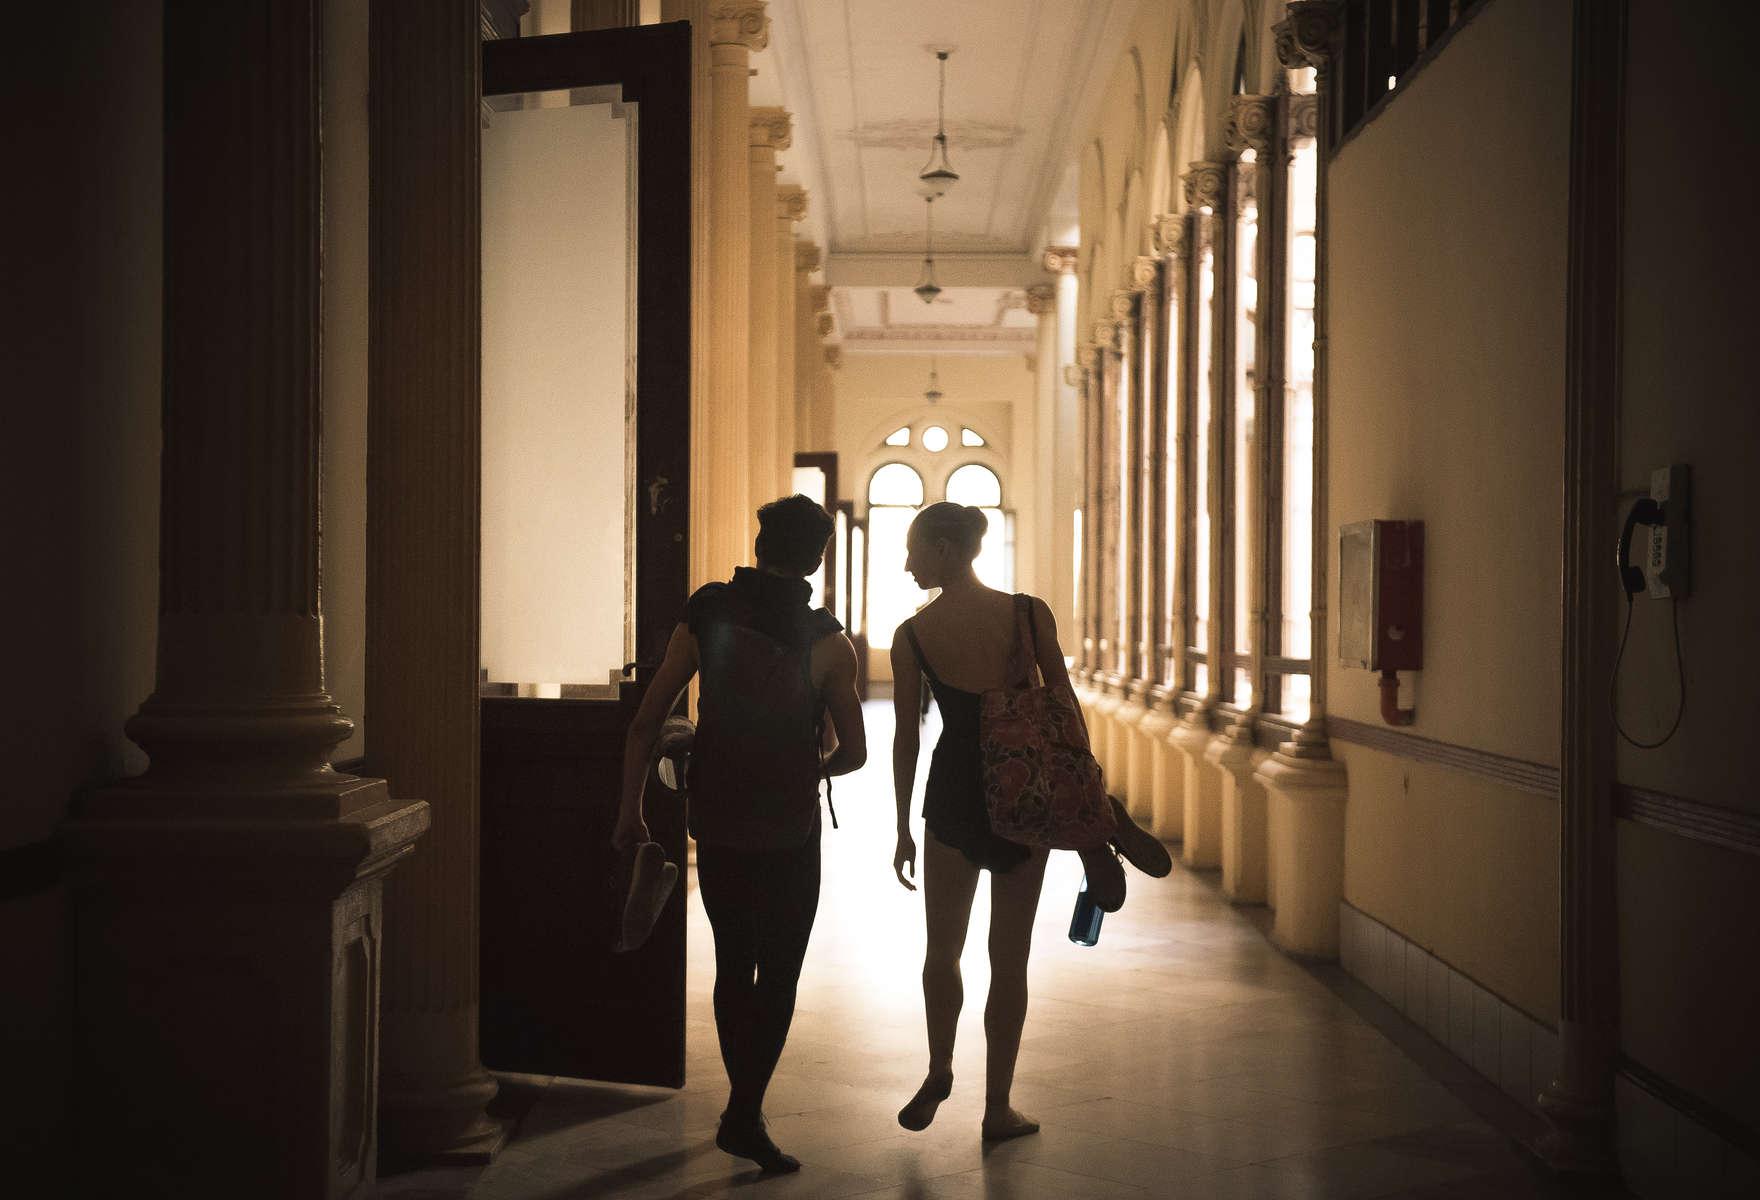 Catherine Conley walks alongside her boyfriend and fellow student Dario Hernandez Robaina in between classes at the Cuban National School of Ballet in Havana, March 10, 2017. ©2018 Alex Garcia